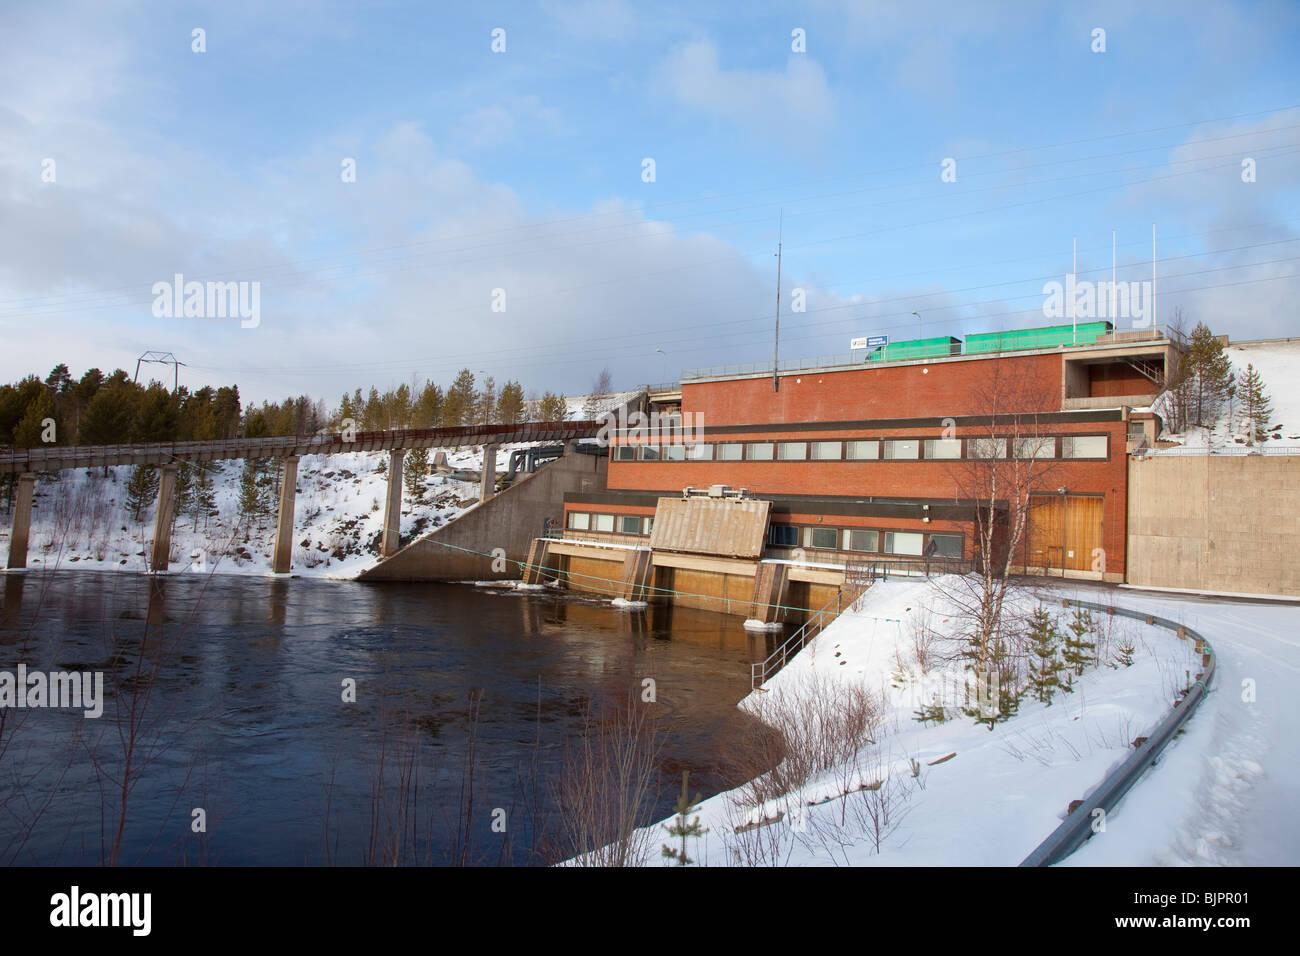 Hydroelectric Water Powerhouse Stock Photos Amp Hydroelectric Water Powerhouse Stock Images